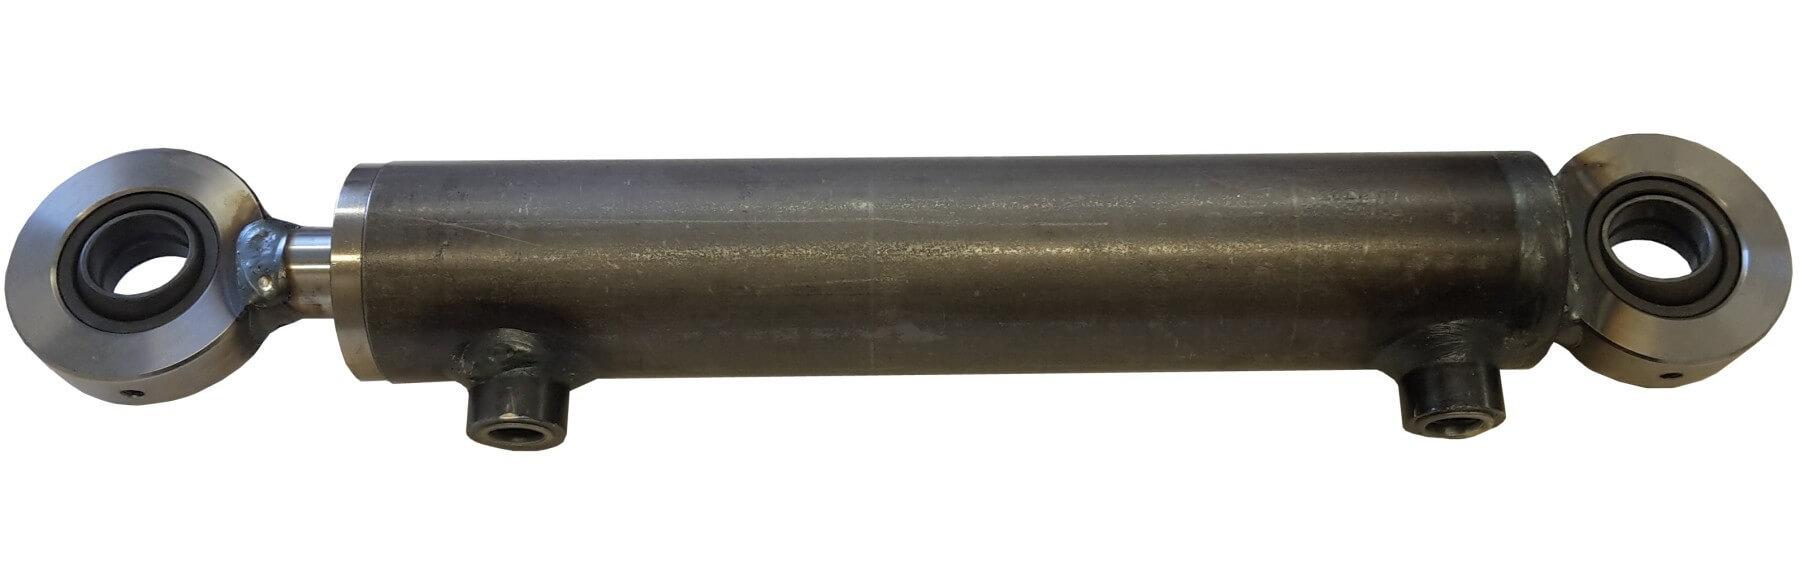 Hydraulisylinteri CL 60. 30. 250 GE